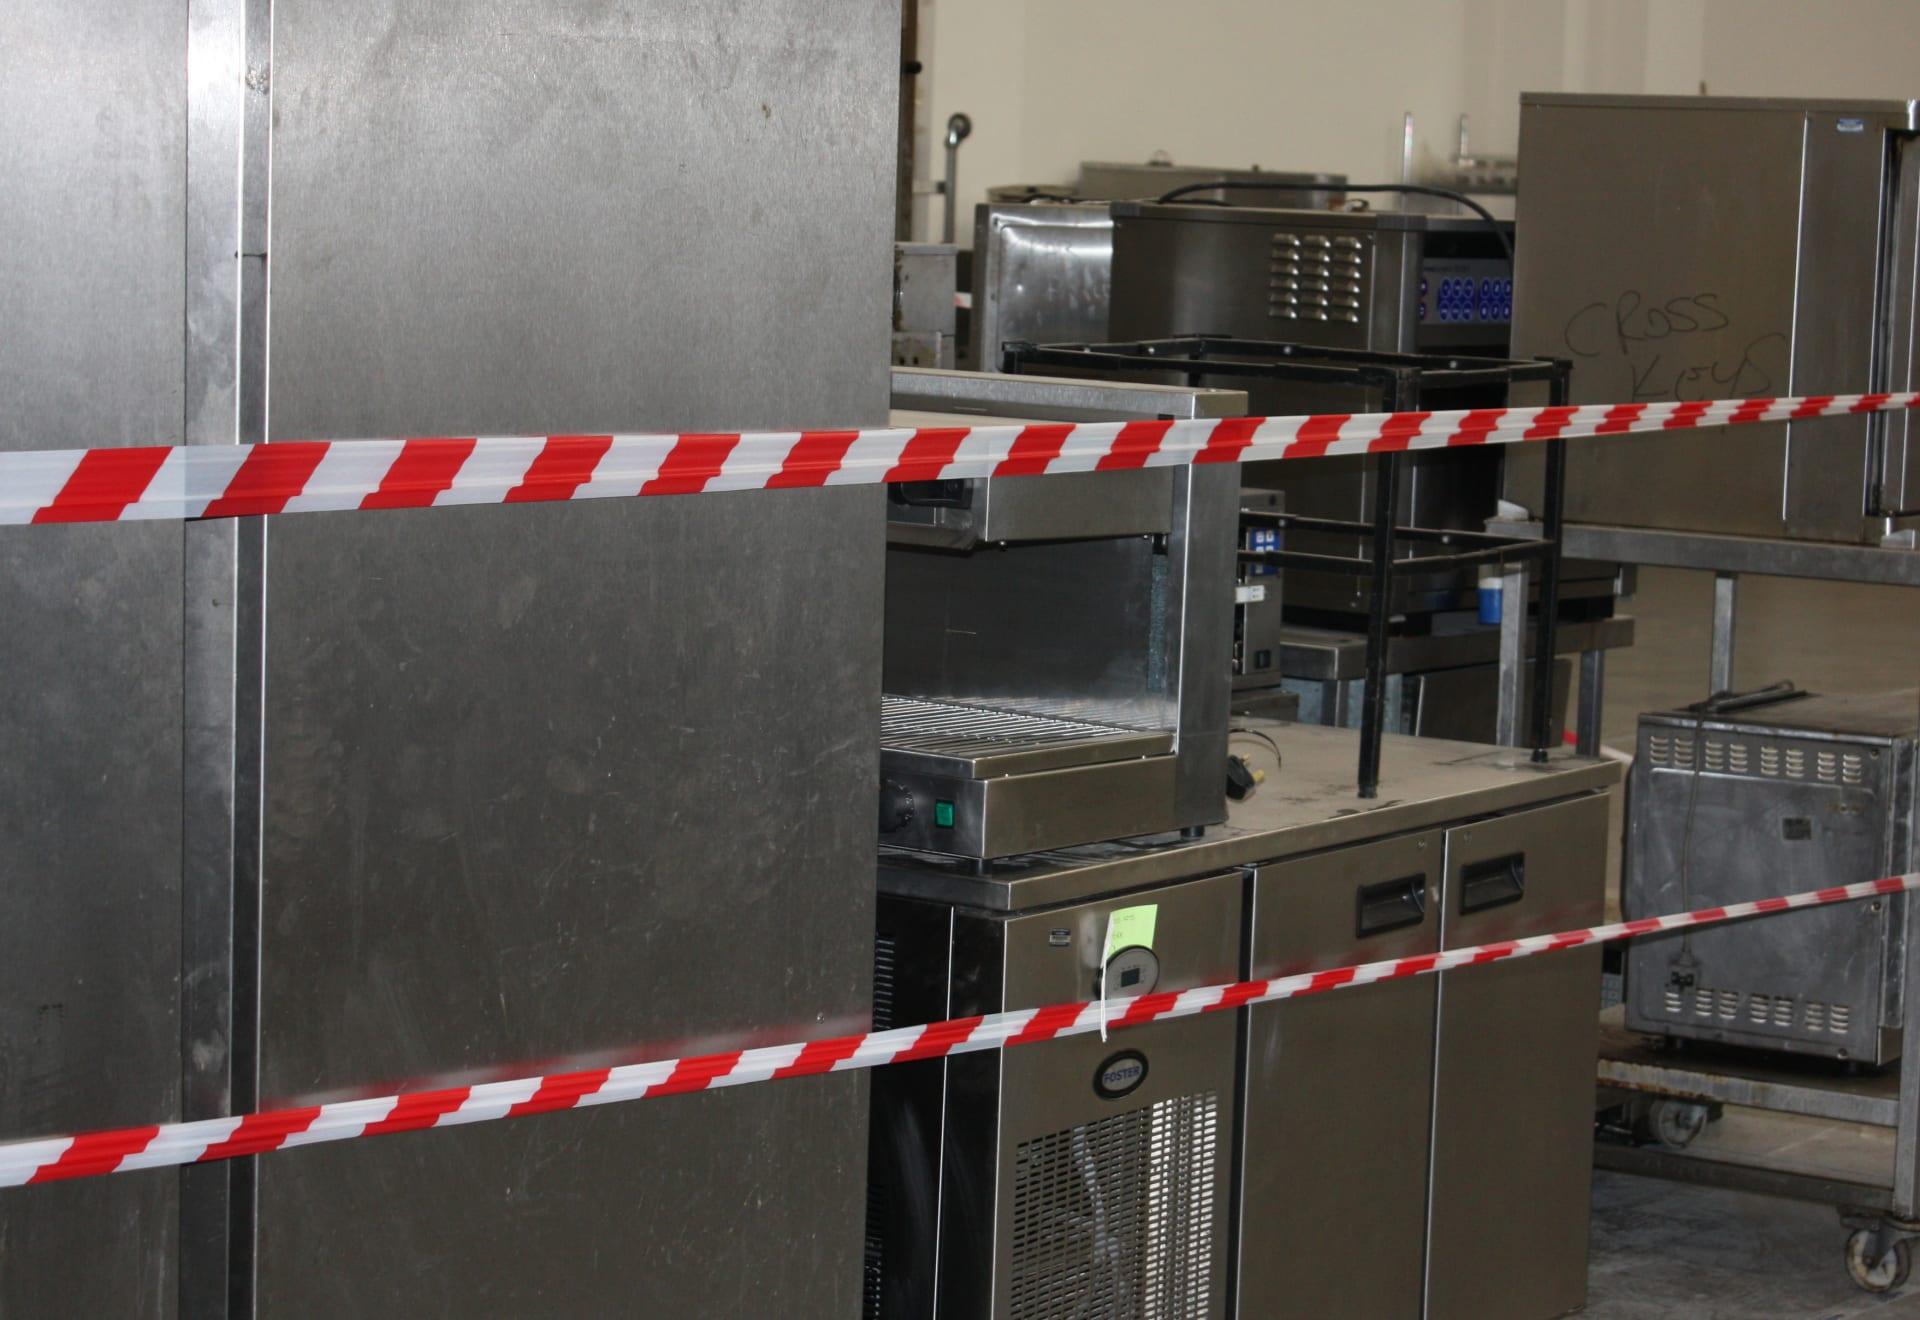 Catering equipment needing repair